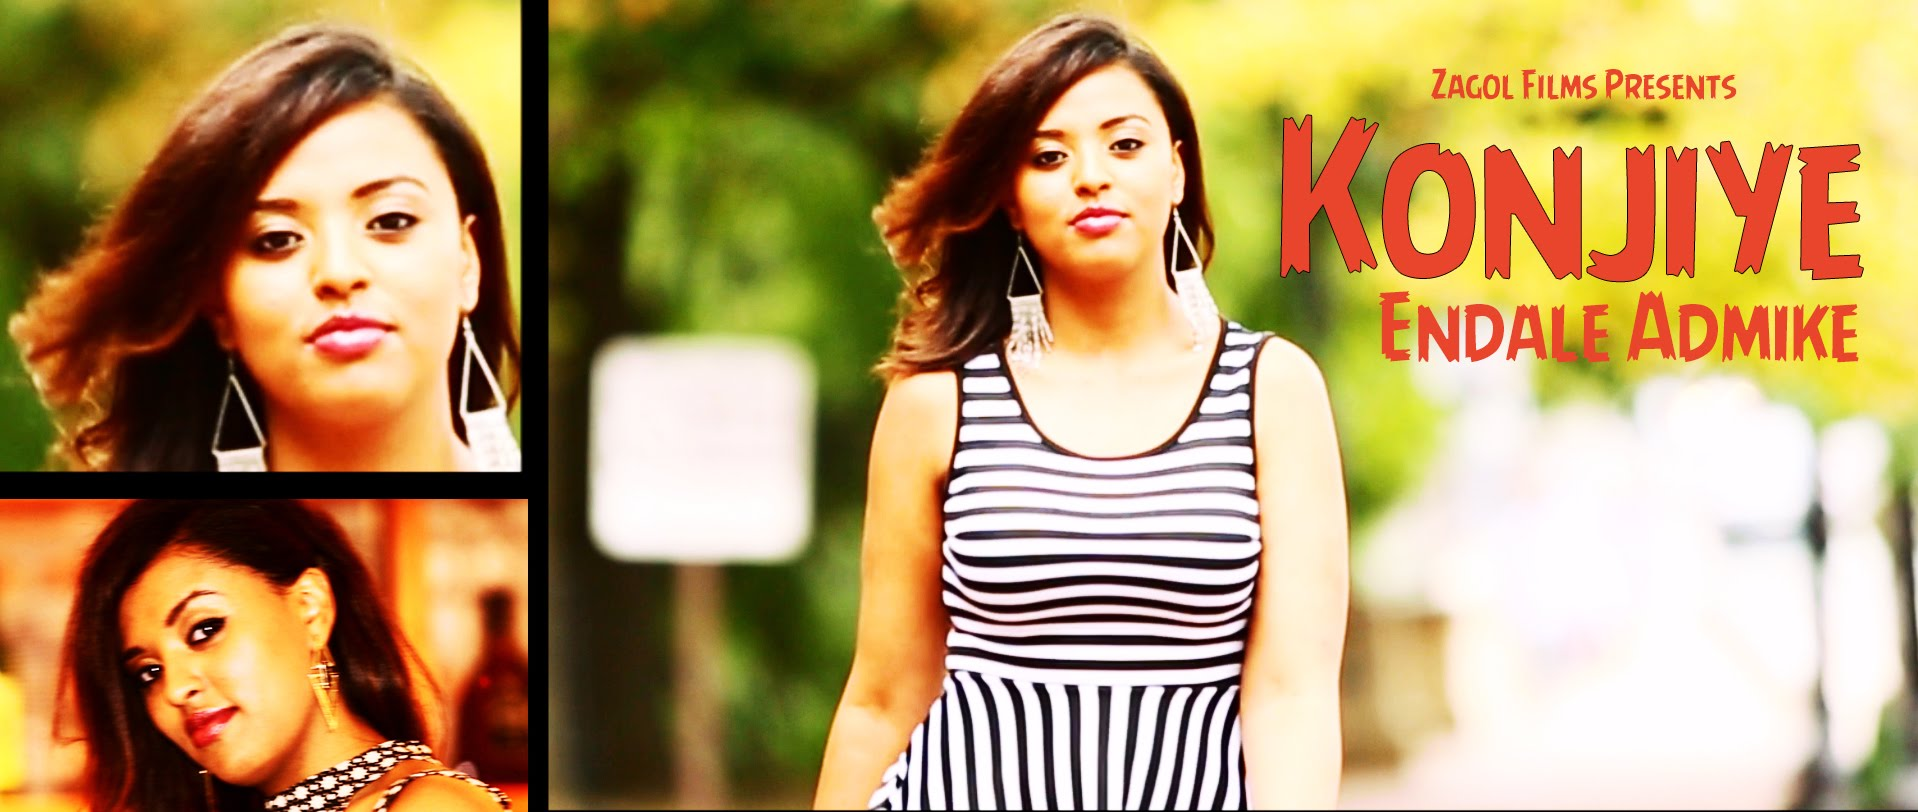 Konjiye - Zagol Films